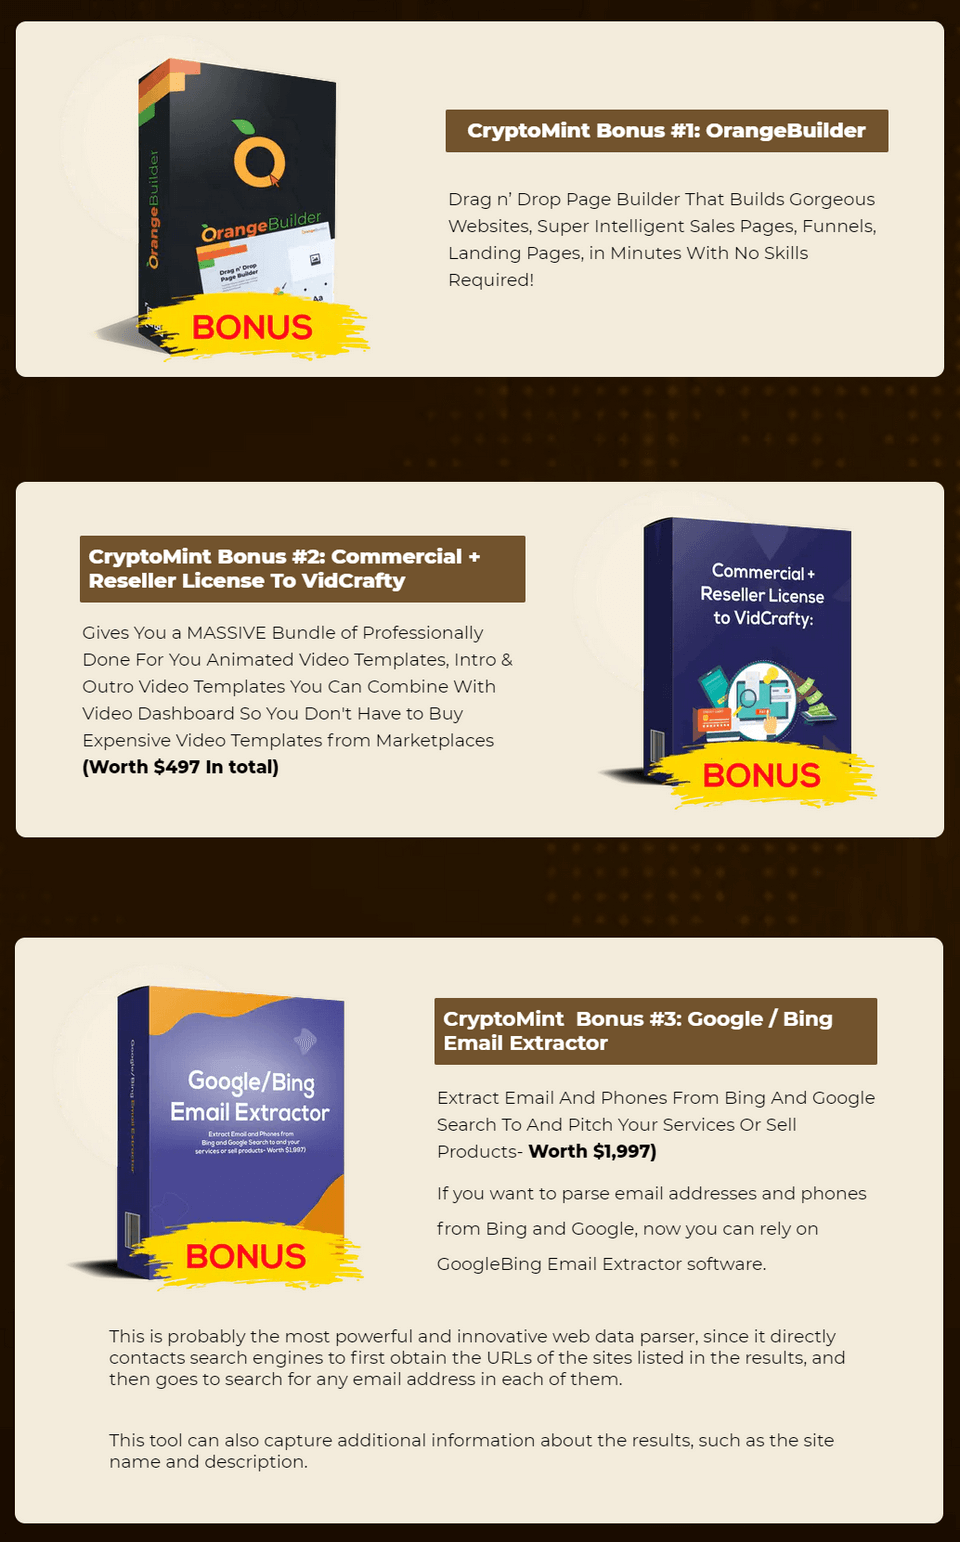 CryptoMint-bonus-1